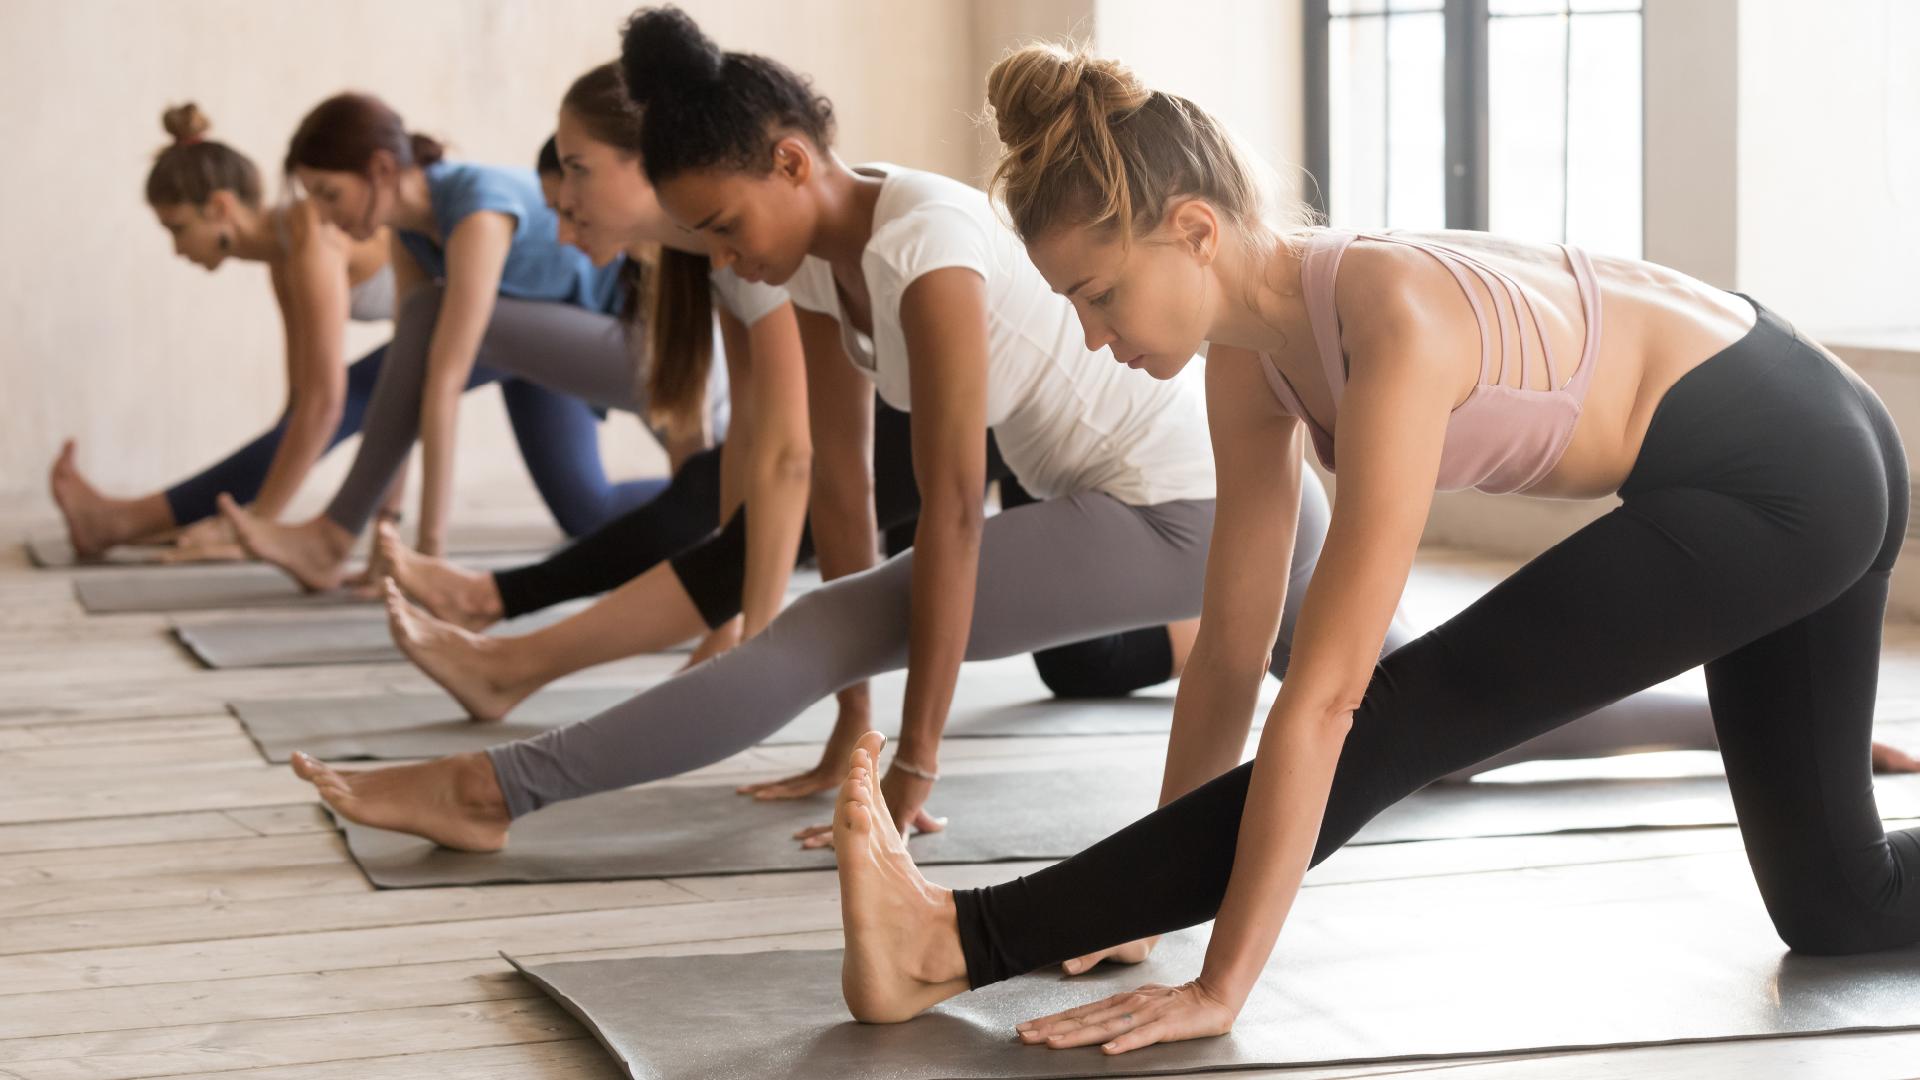 Health & Wellness Influencers Doing Yoga